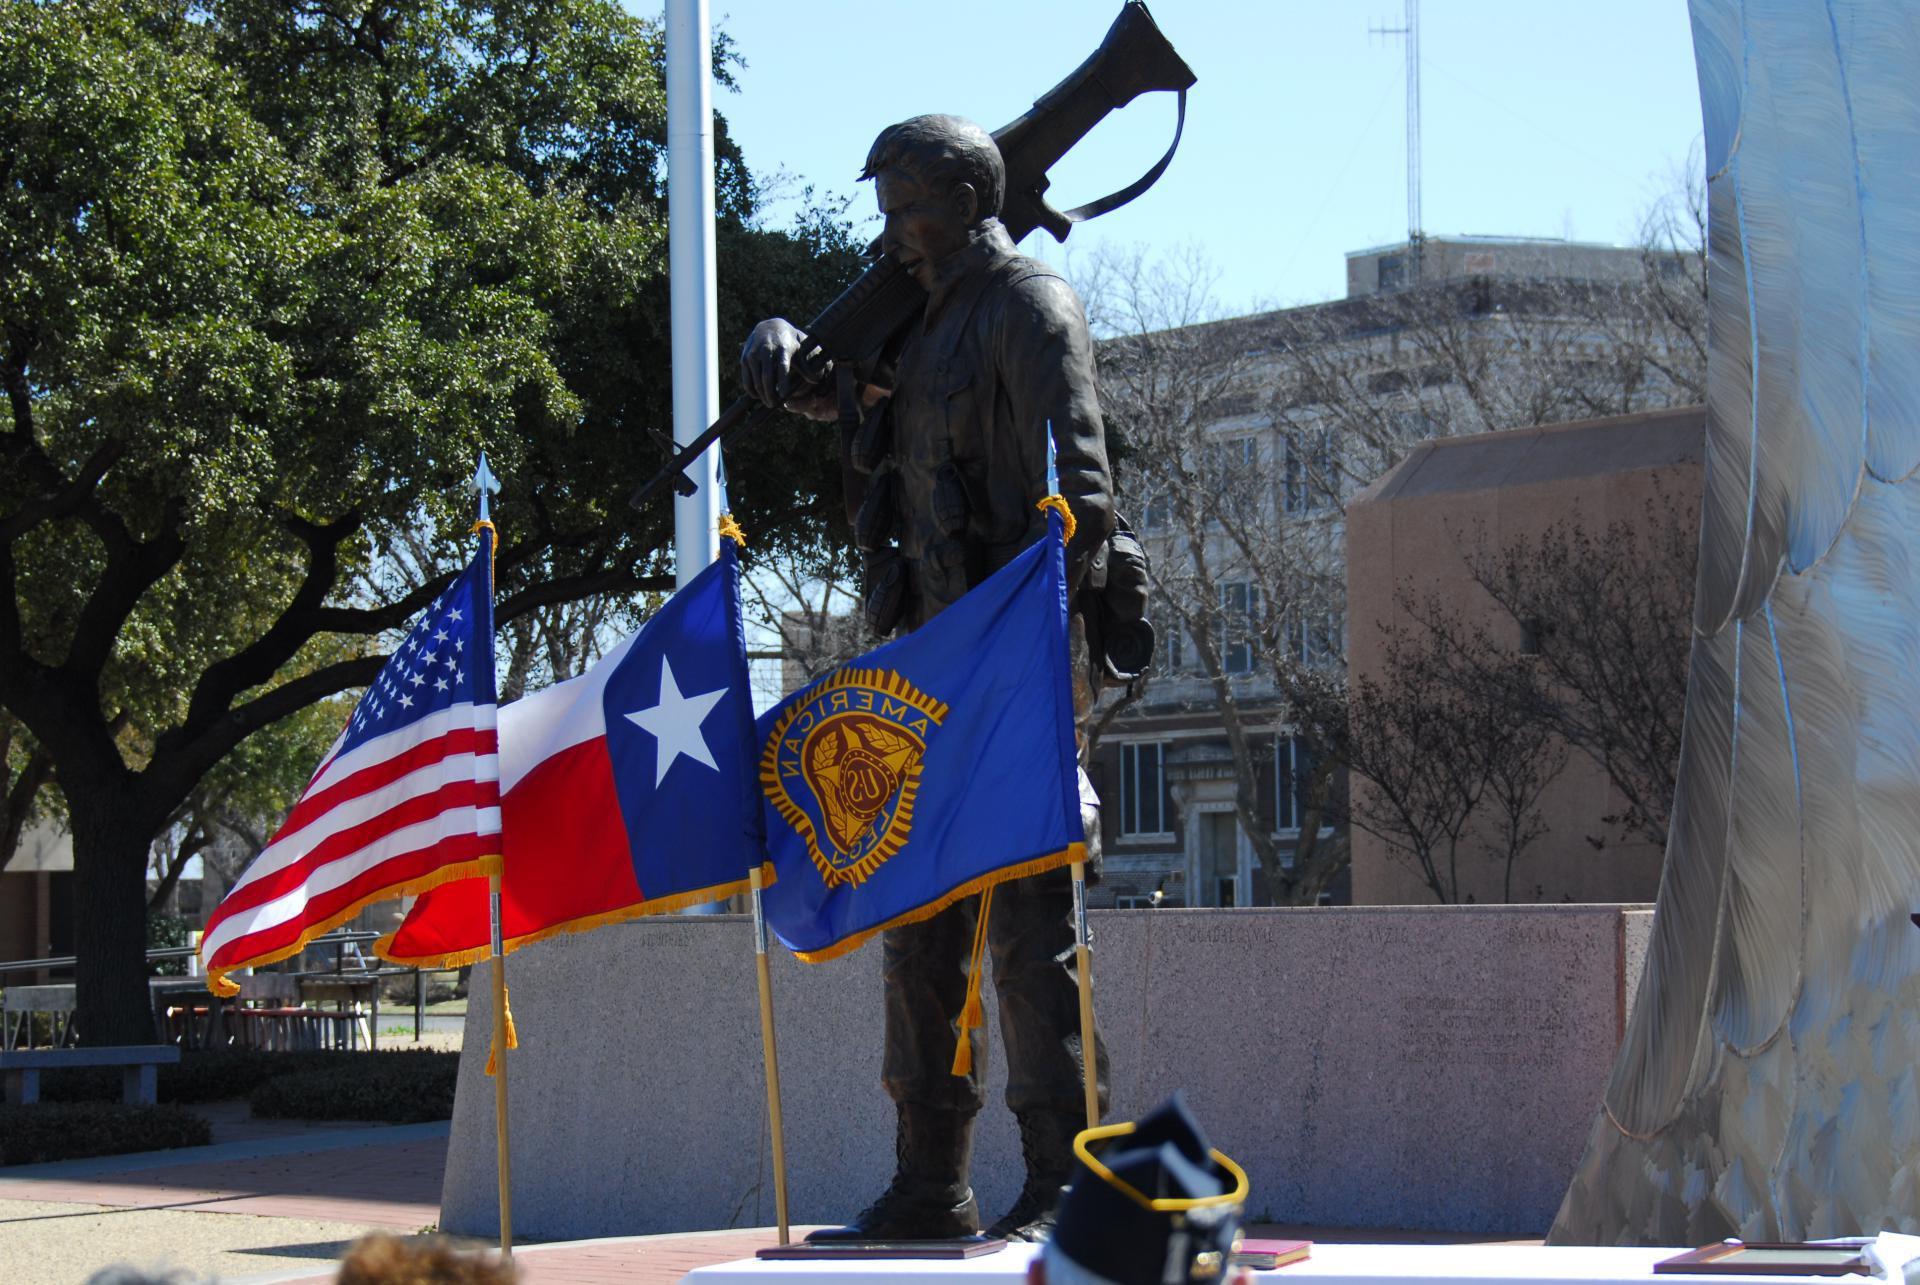 Post 61 Abilene, Texas